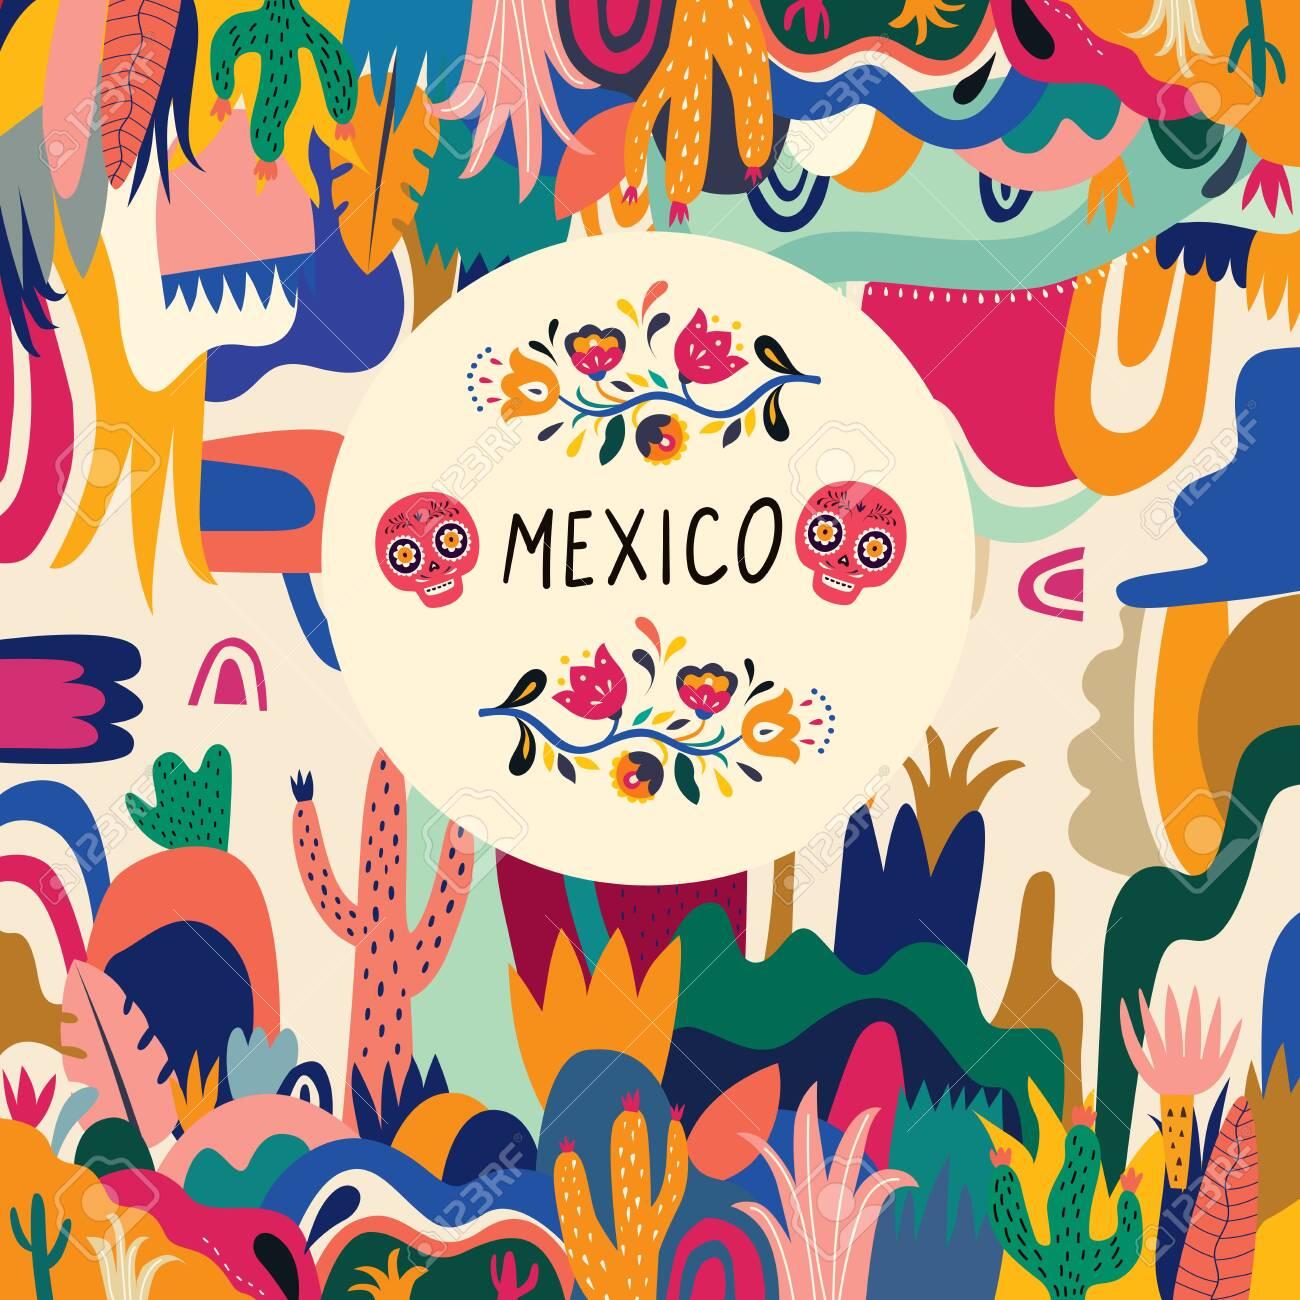 Colorful Mexican Design Stylish Artistic Mexican Decor For Mexican Holidays And Party Clip Art Libres De Droits Vecteurs Et Illustration Image 130428443